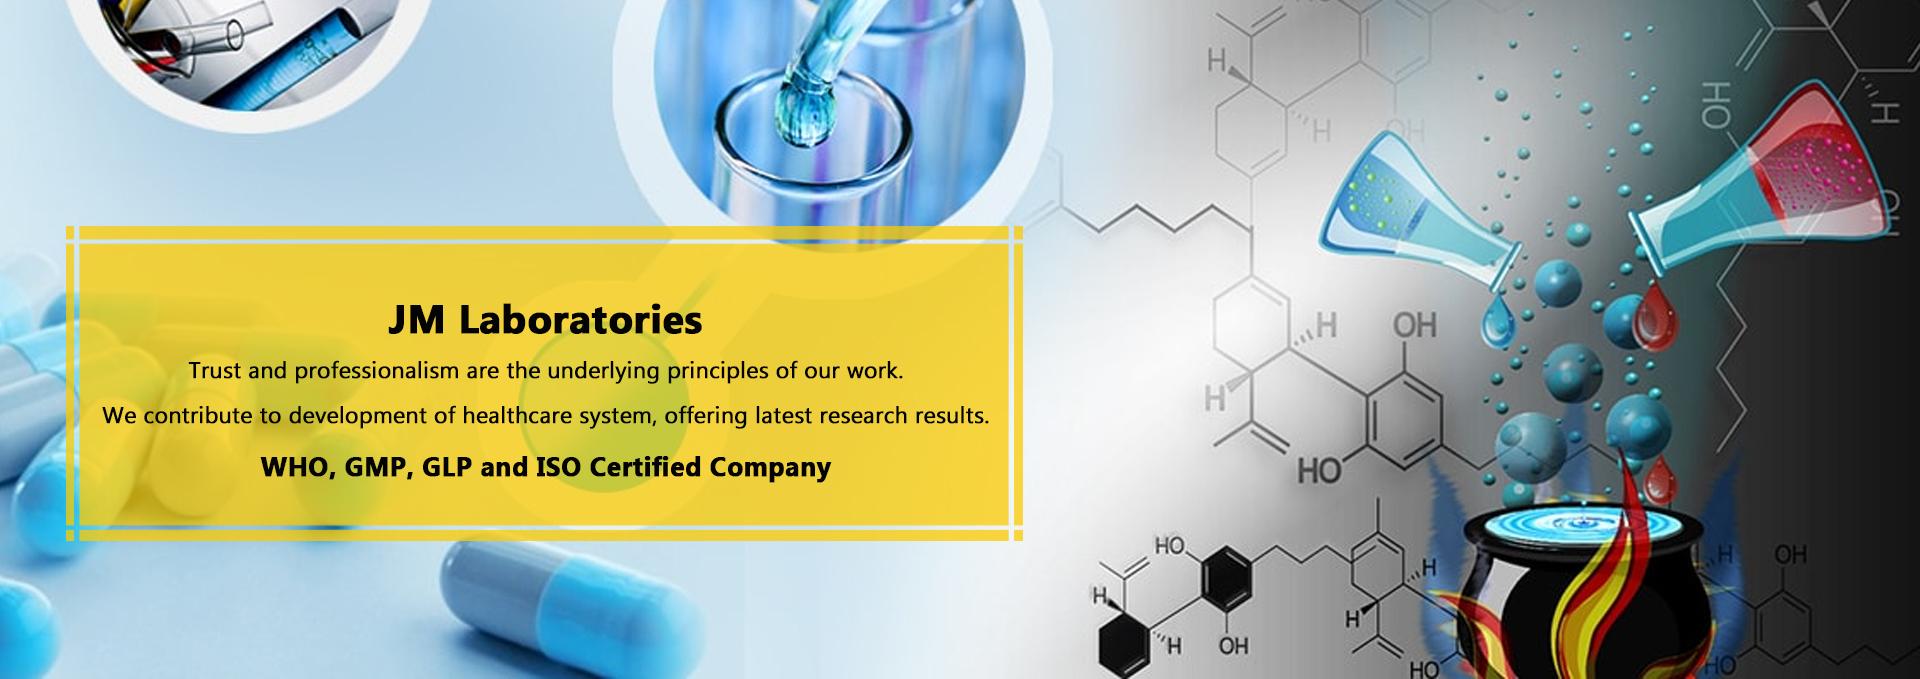 JM Laboratories